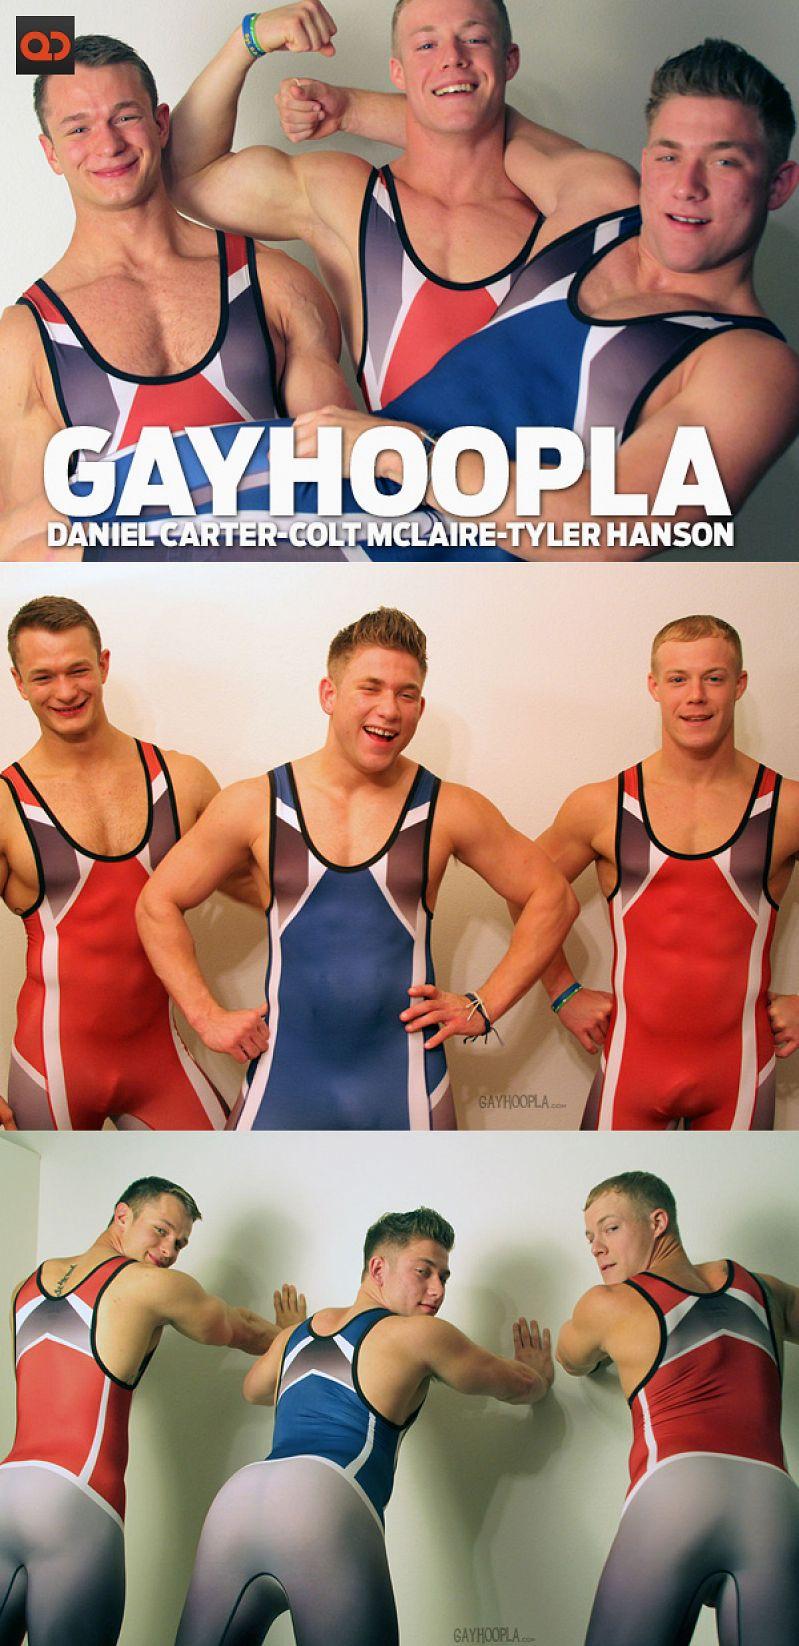 GayHoopla – Colt Mclaire, Tyler Hanson and Daniel Carter